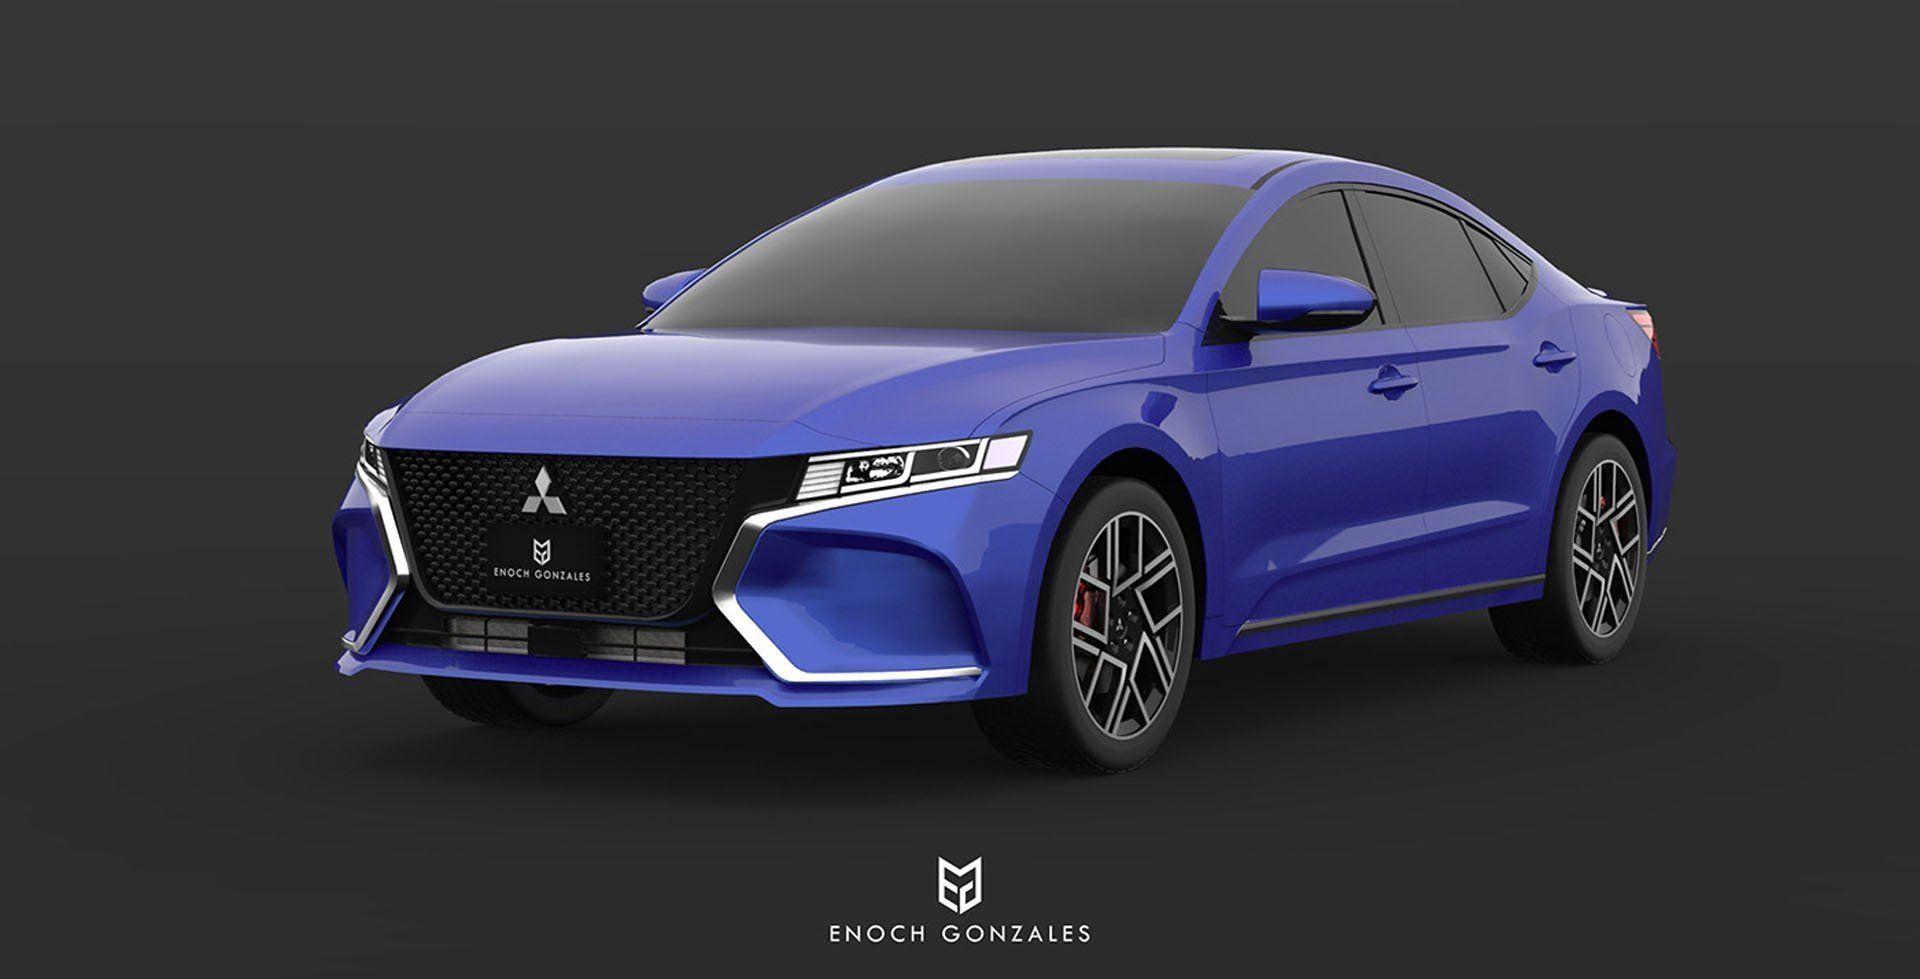 New 2020 Mitsubishi Galant Redesign Car Price 2019 Mitsubishi Galant Mitsubishi Sedan